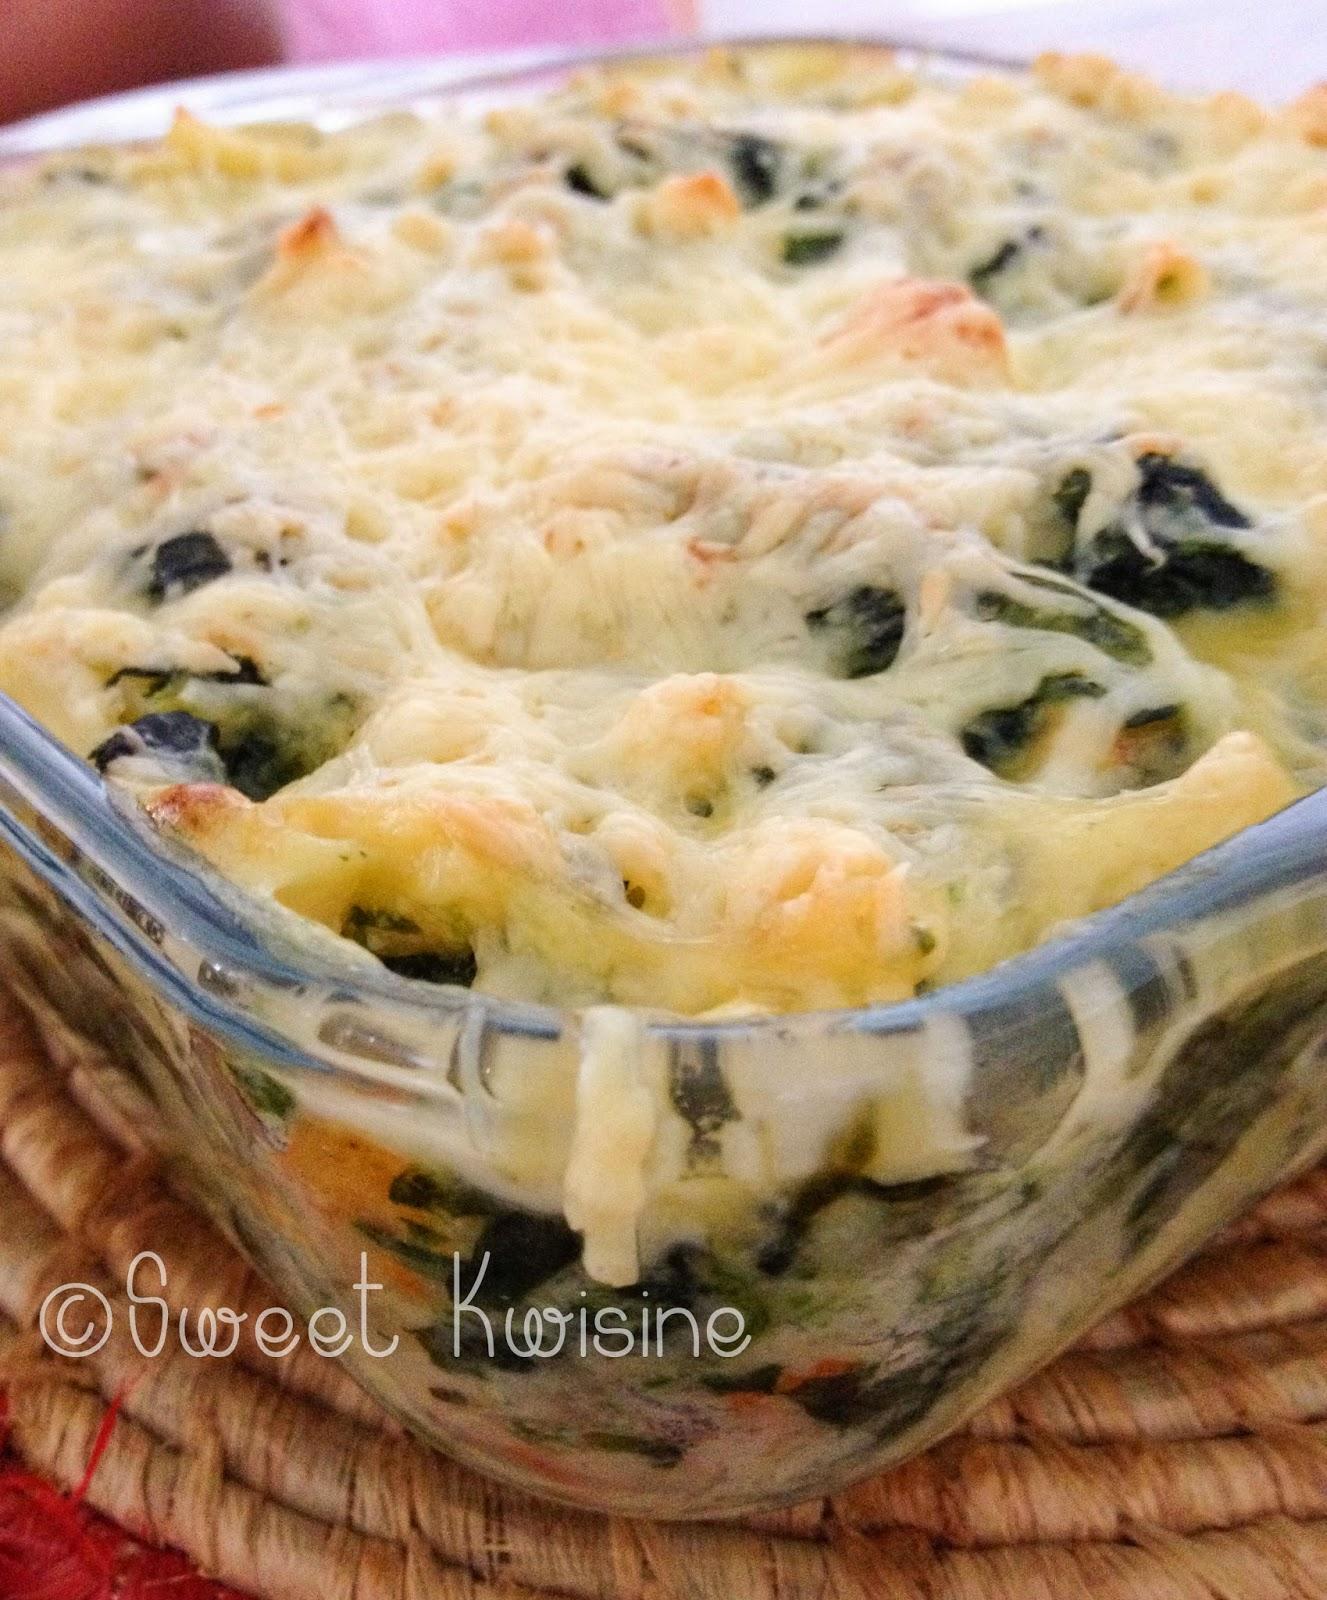 sweet kwisine, pates, pasta, macaroni, gratin, épinard, spinach, crevettes, shrimp, bécahmel, cuisine facile, cuisine familiale